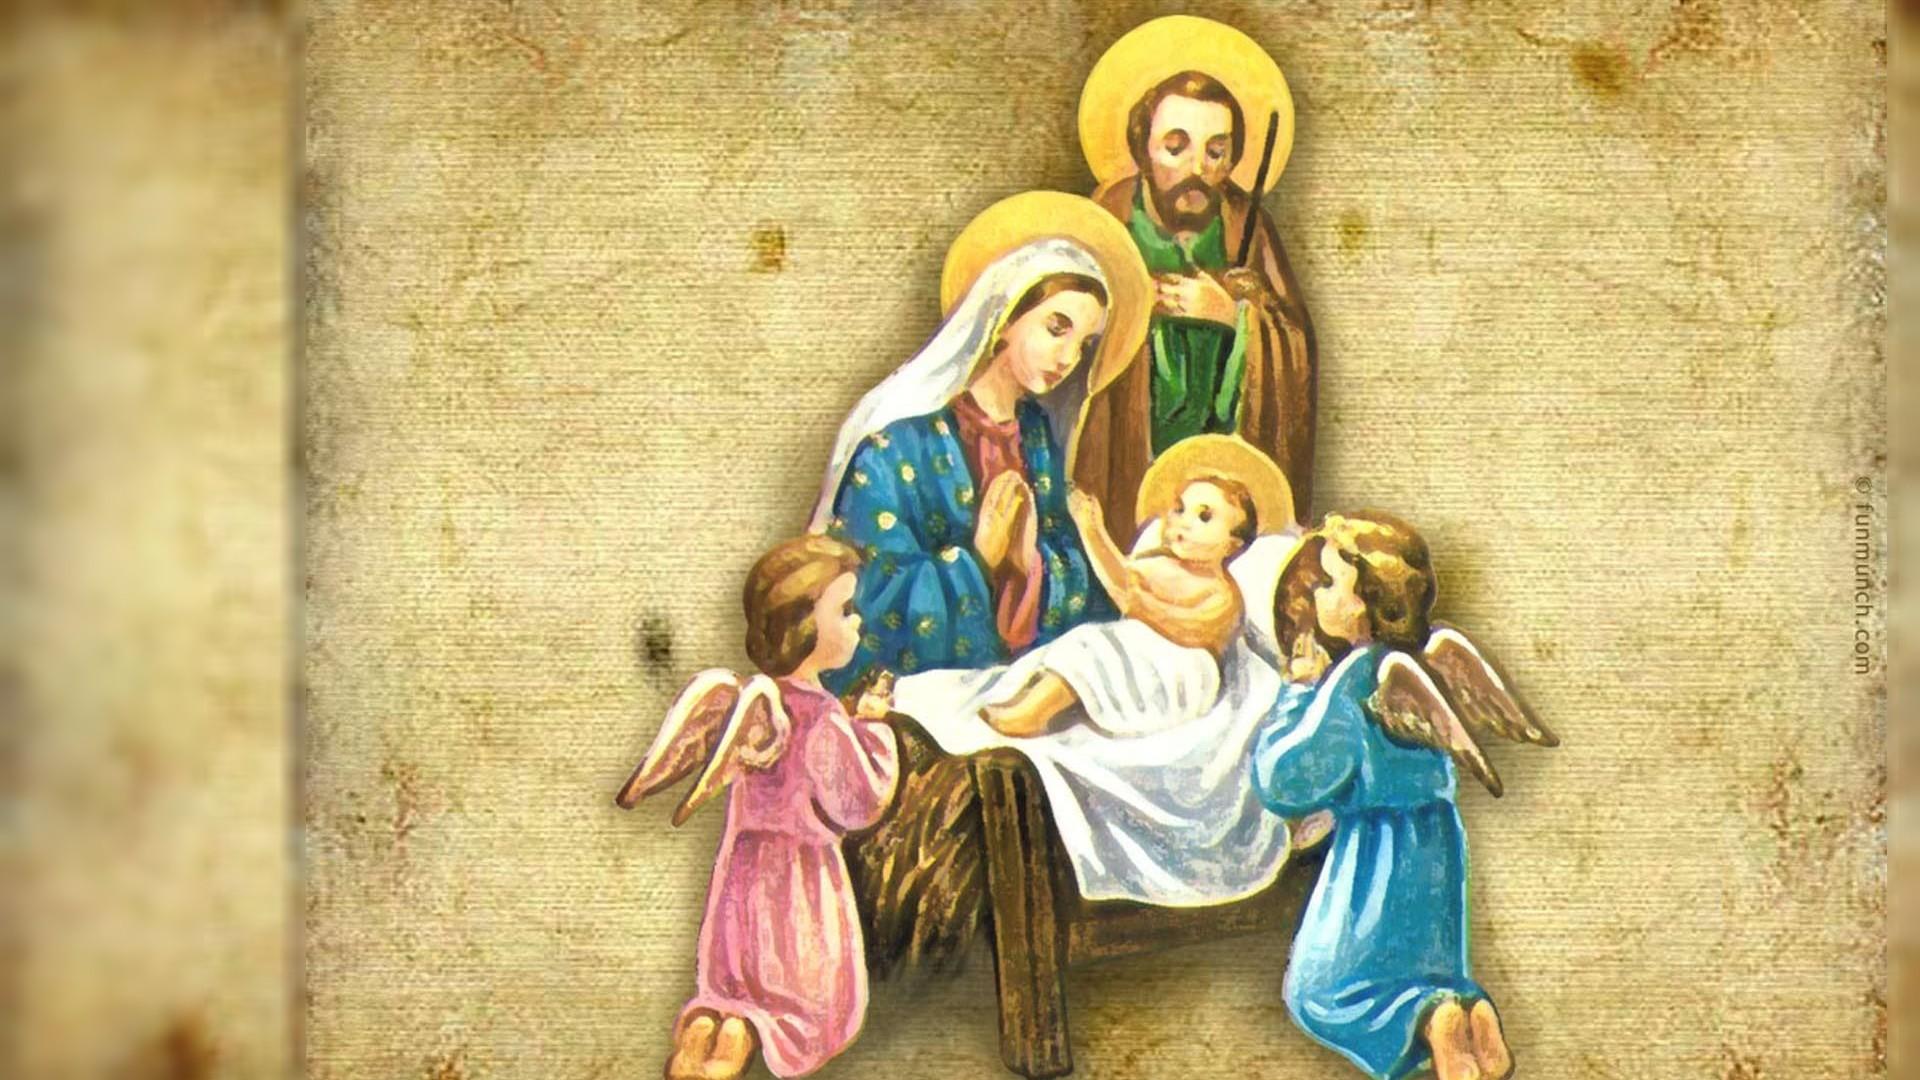 Catholic Wallpaper Download Free Amazing High Resolution